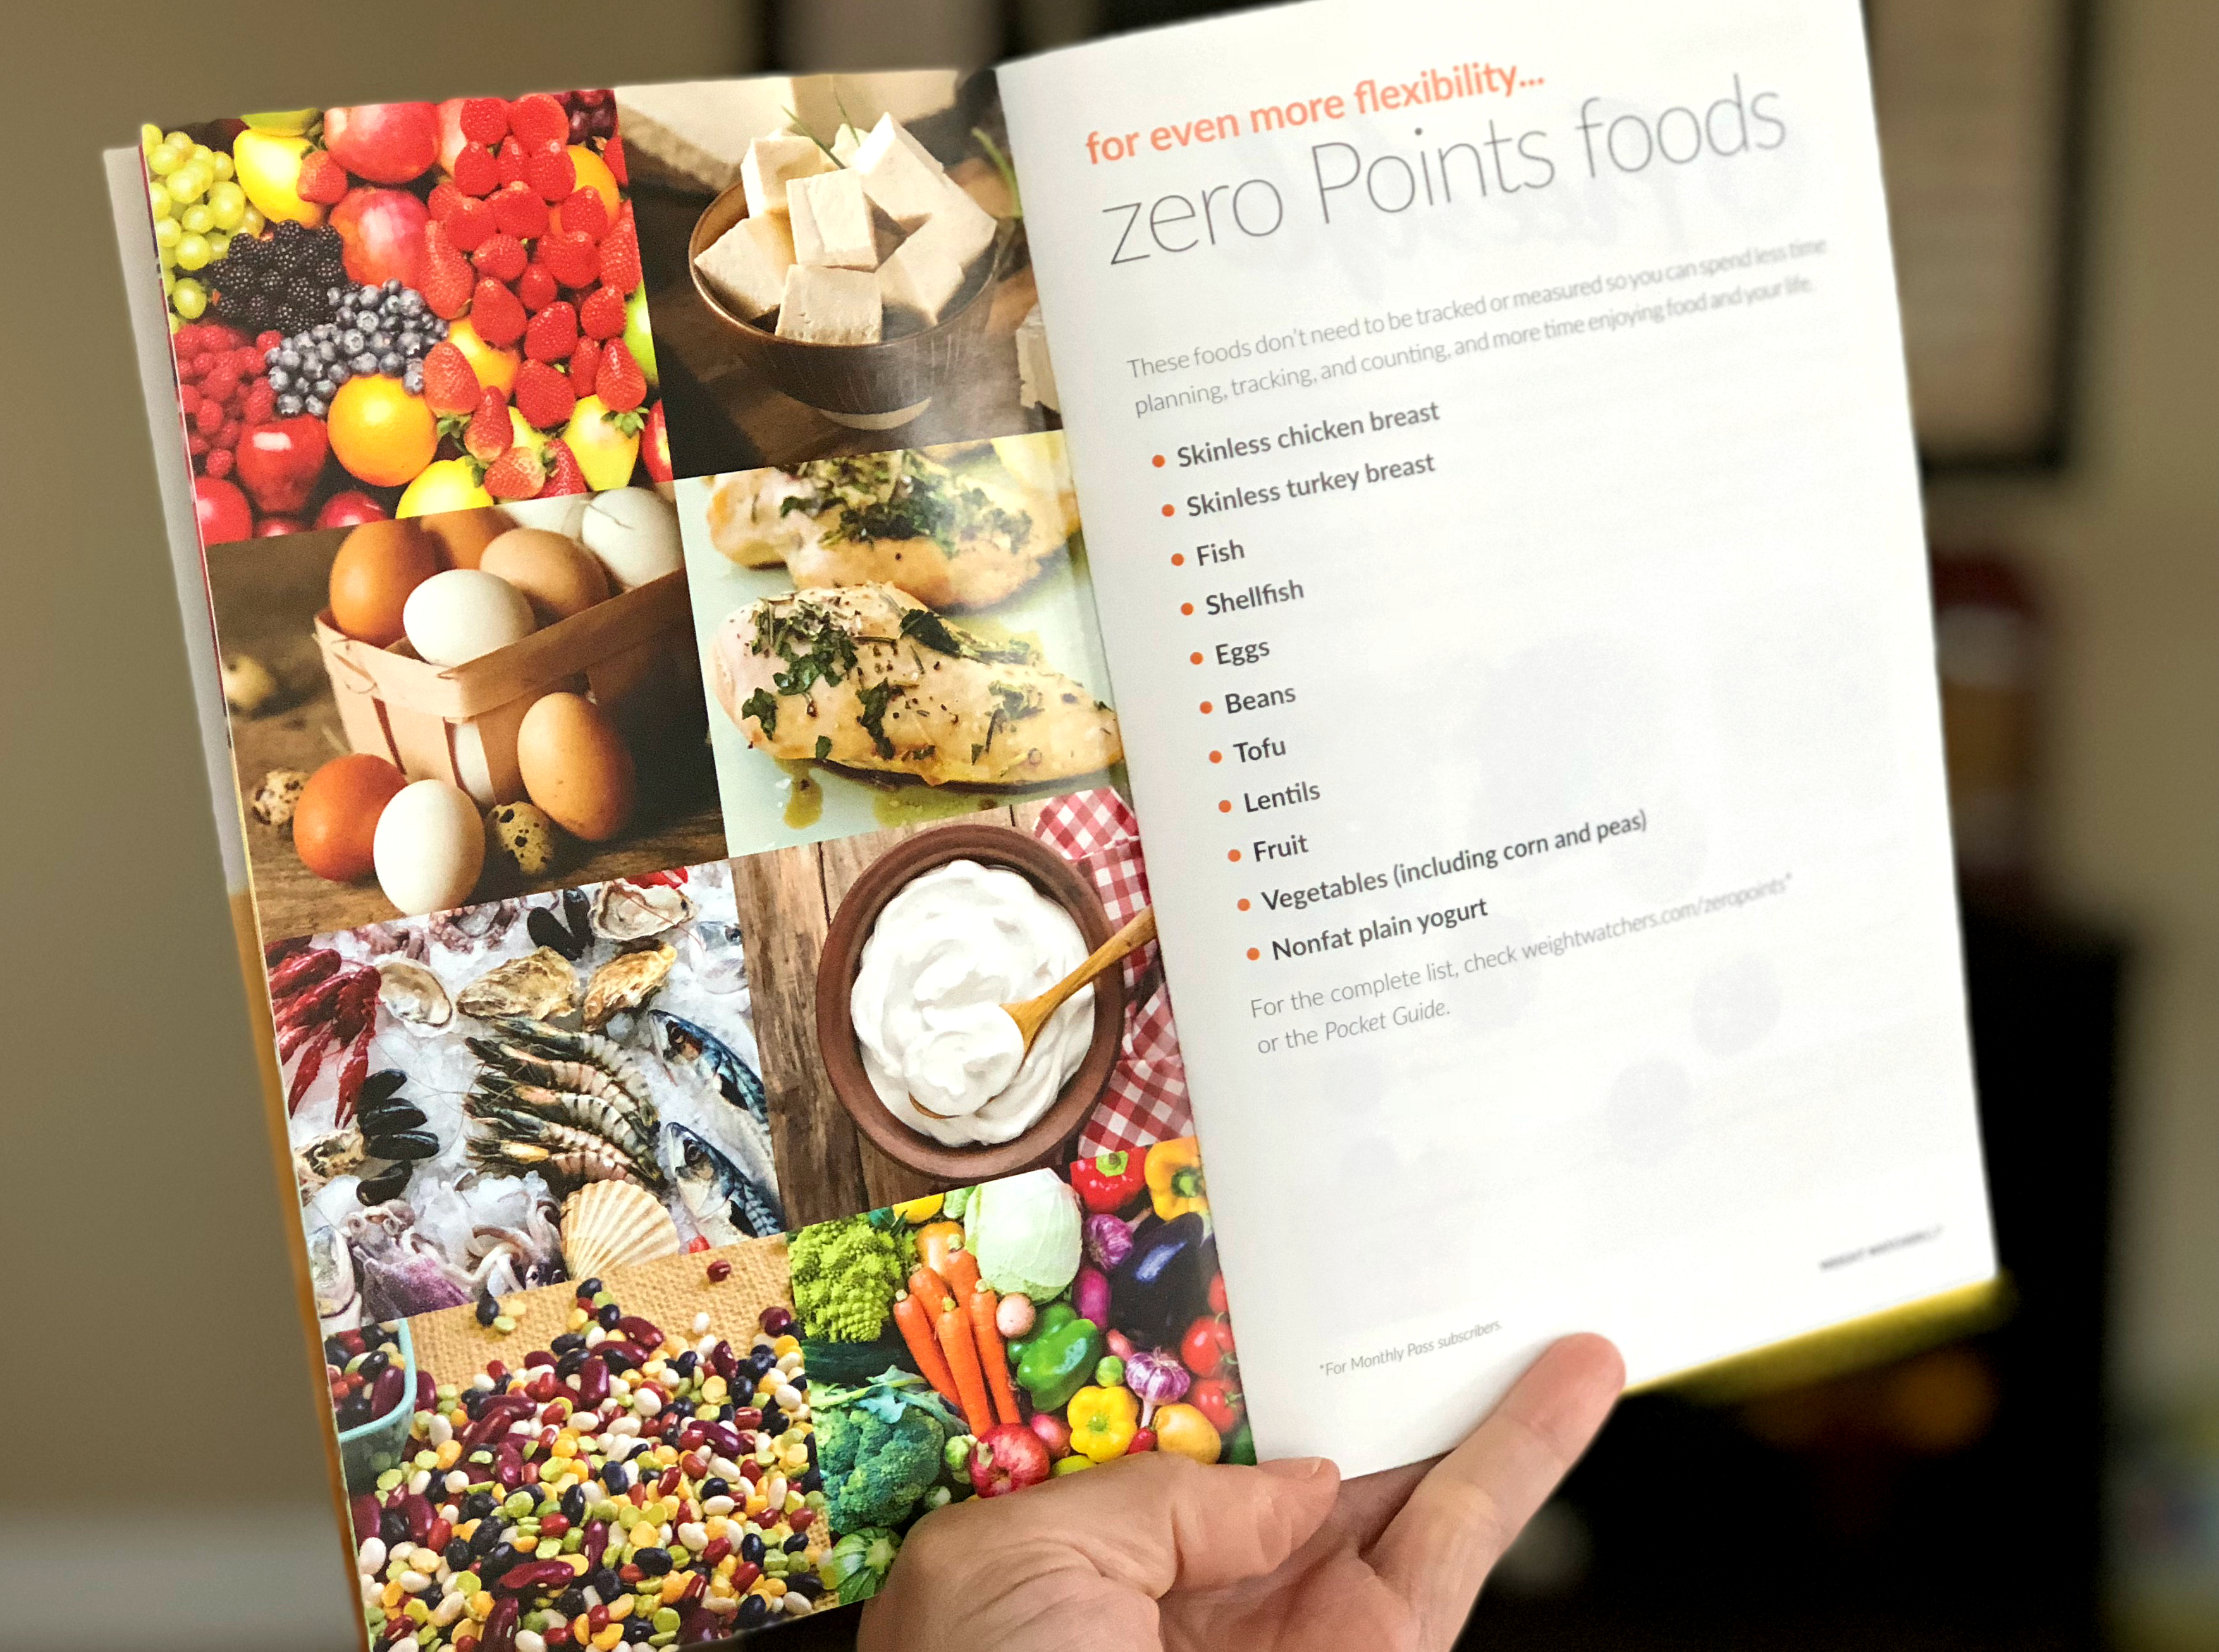 weight watchers onlineplus plan – Weight Watchers Zero point foods guide